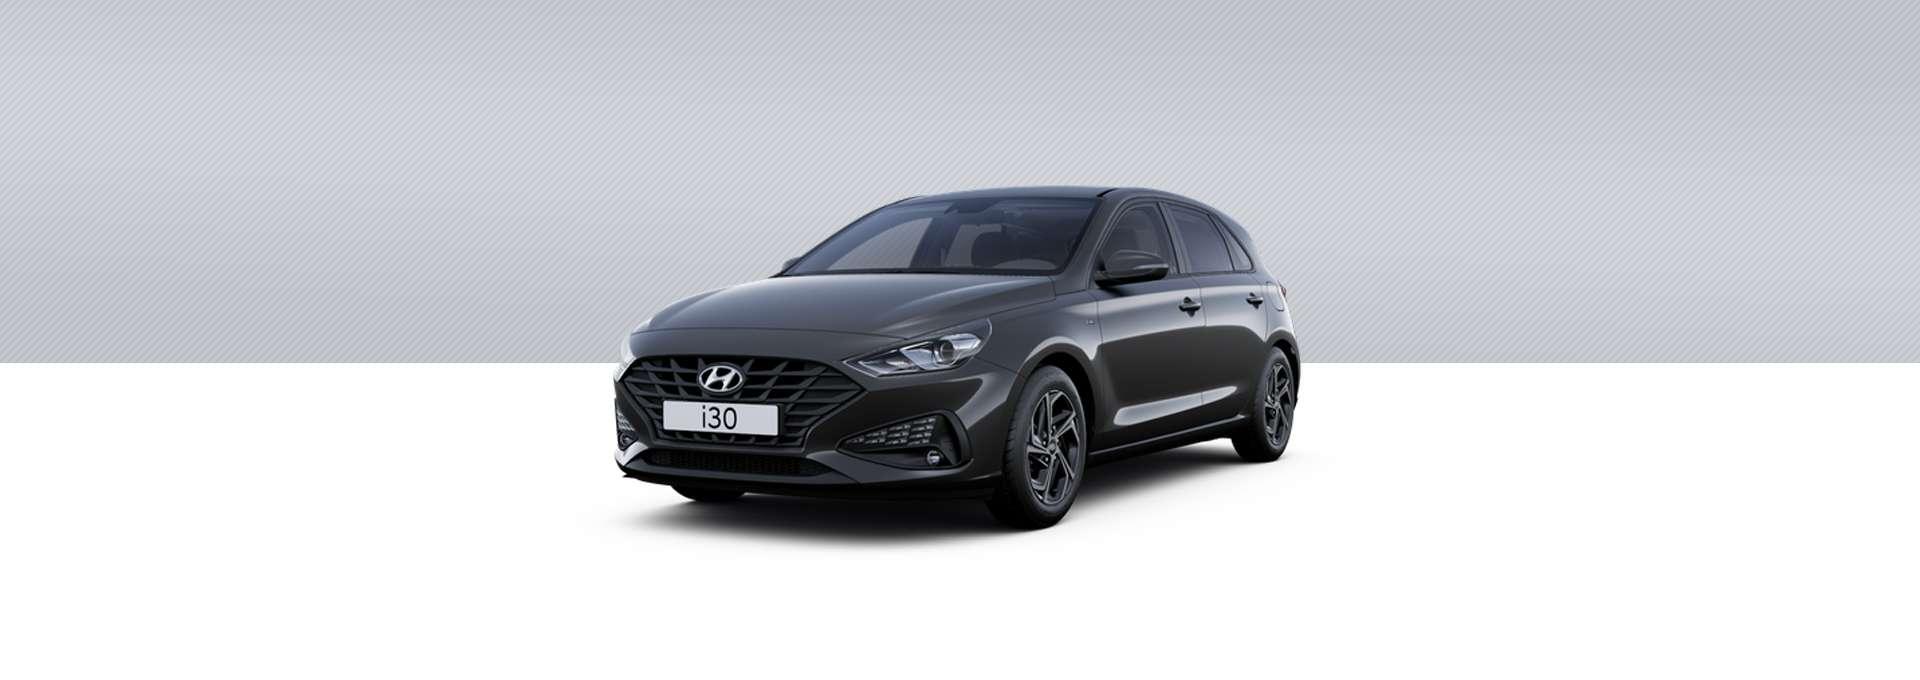 Hyundai Nuevo i30 Híbrido 48V